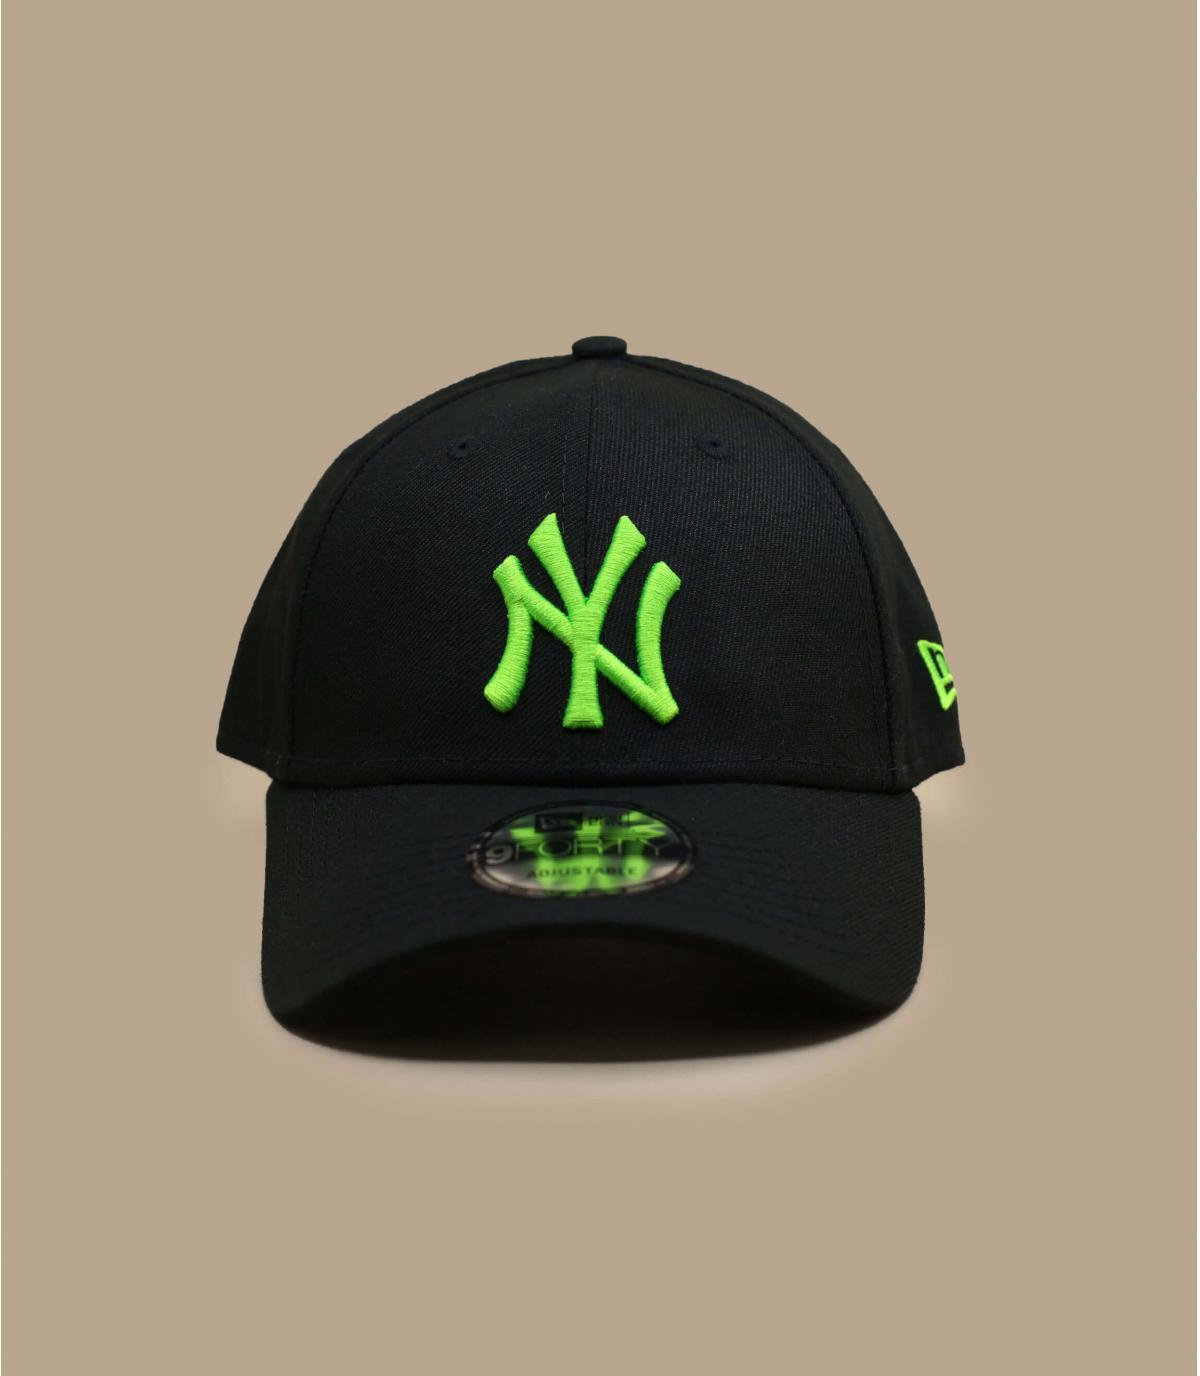 Details Neon Pack NY 940 black green - Abbildung 2